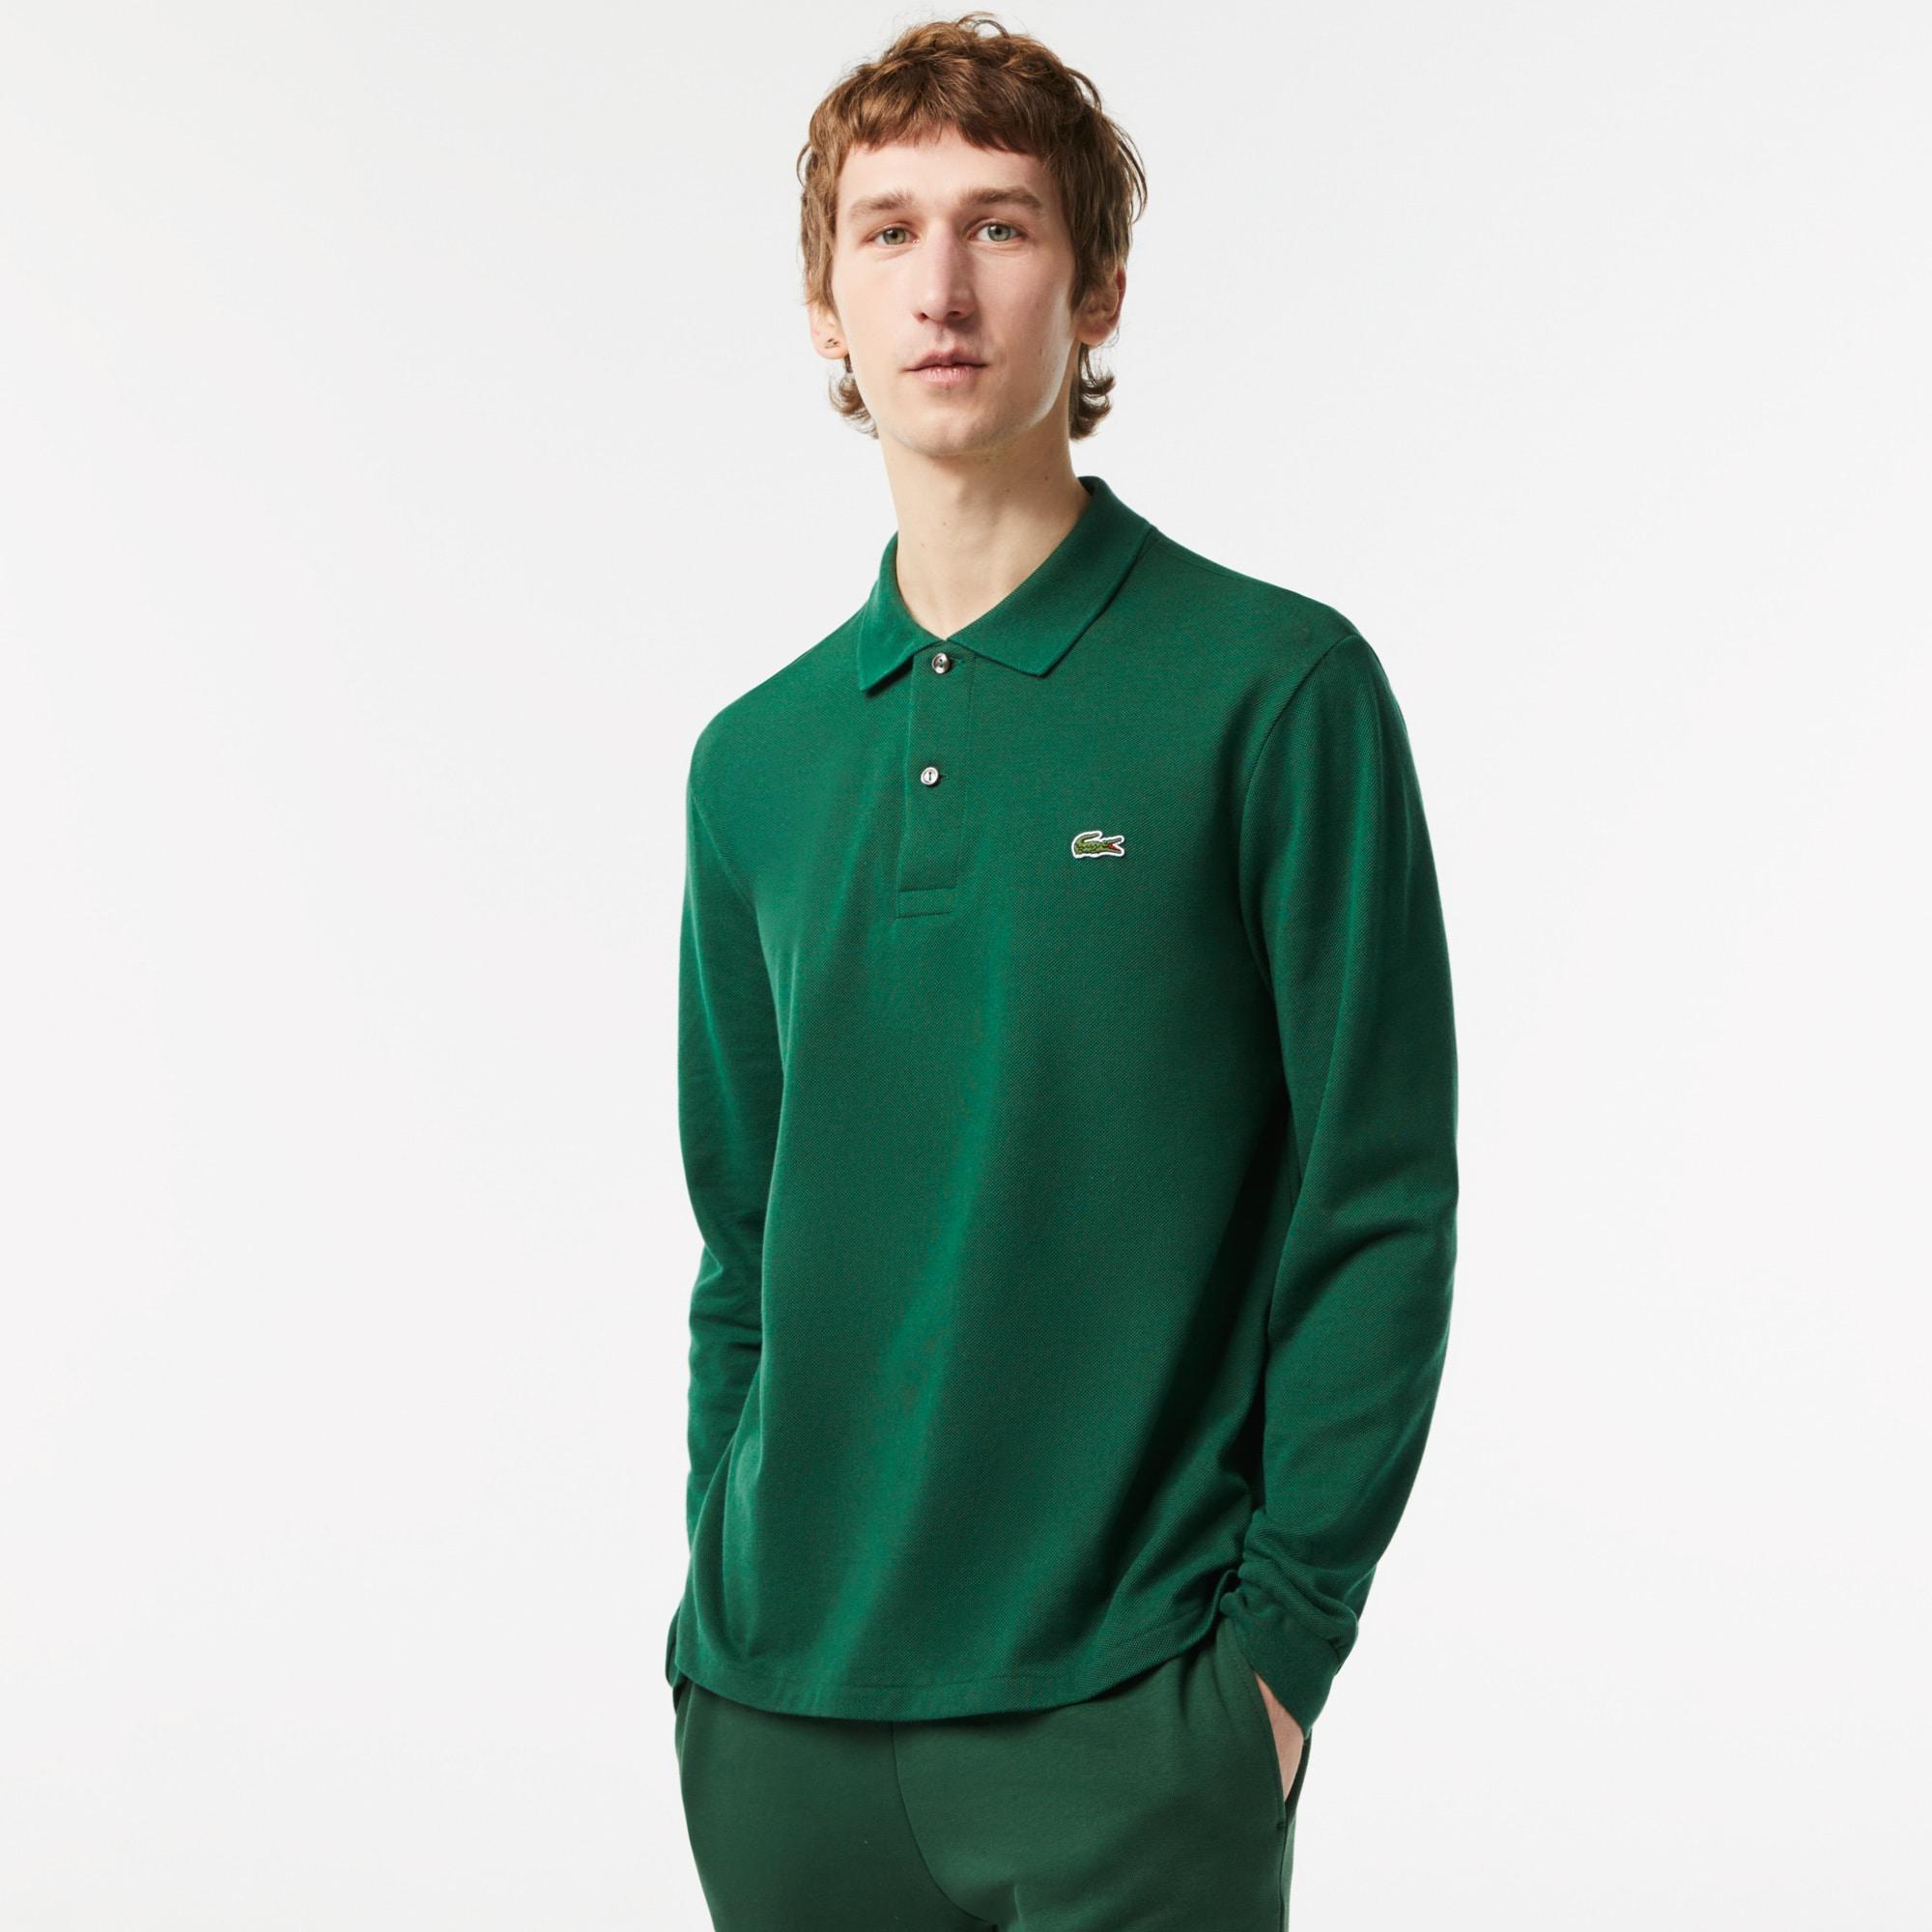 1fbf40f9 Men's Polo Shirts | Polo shirts for men | LACOSTE